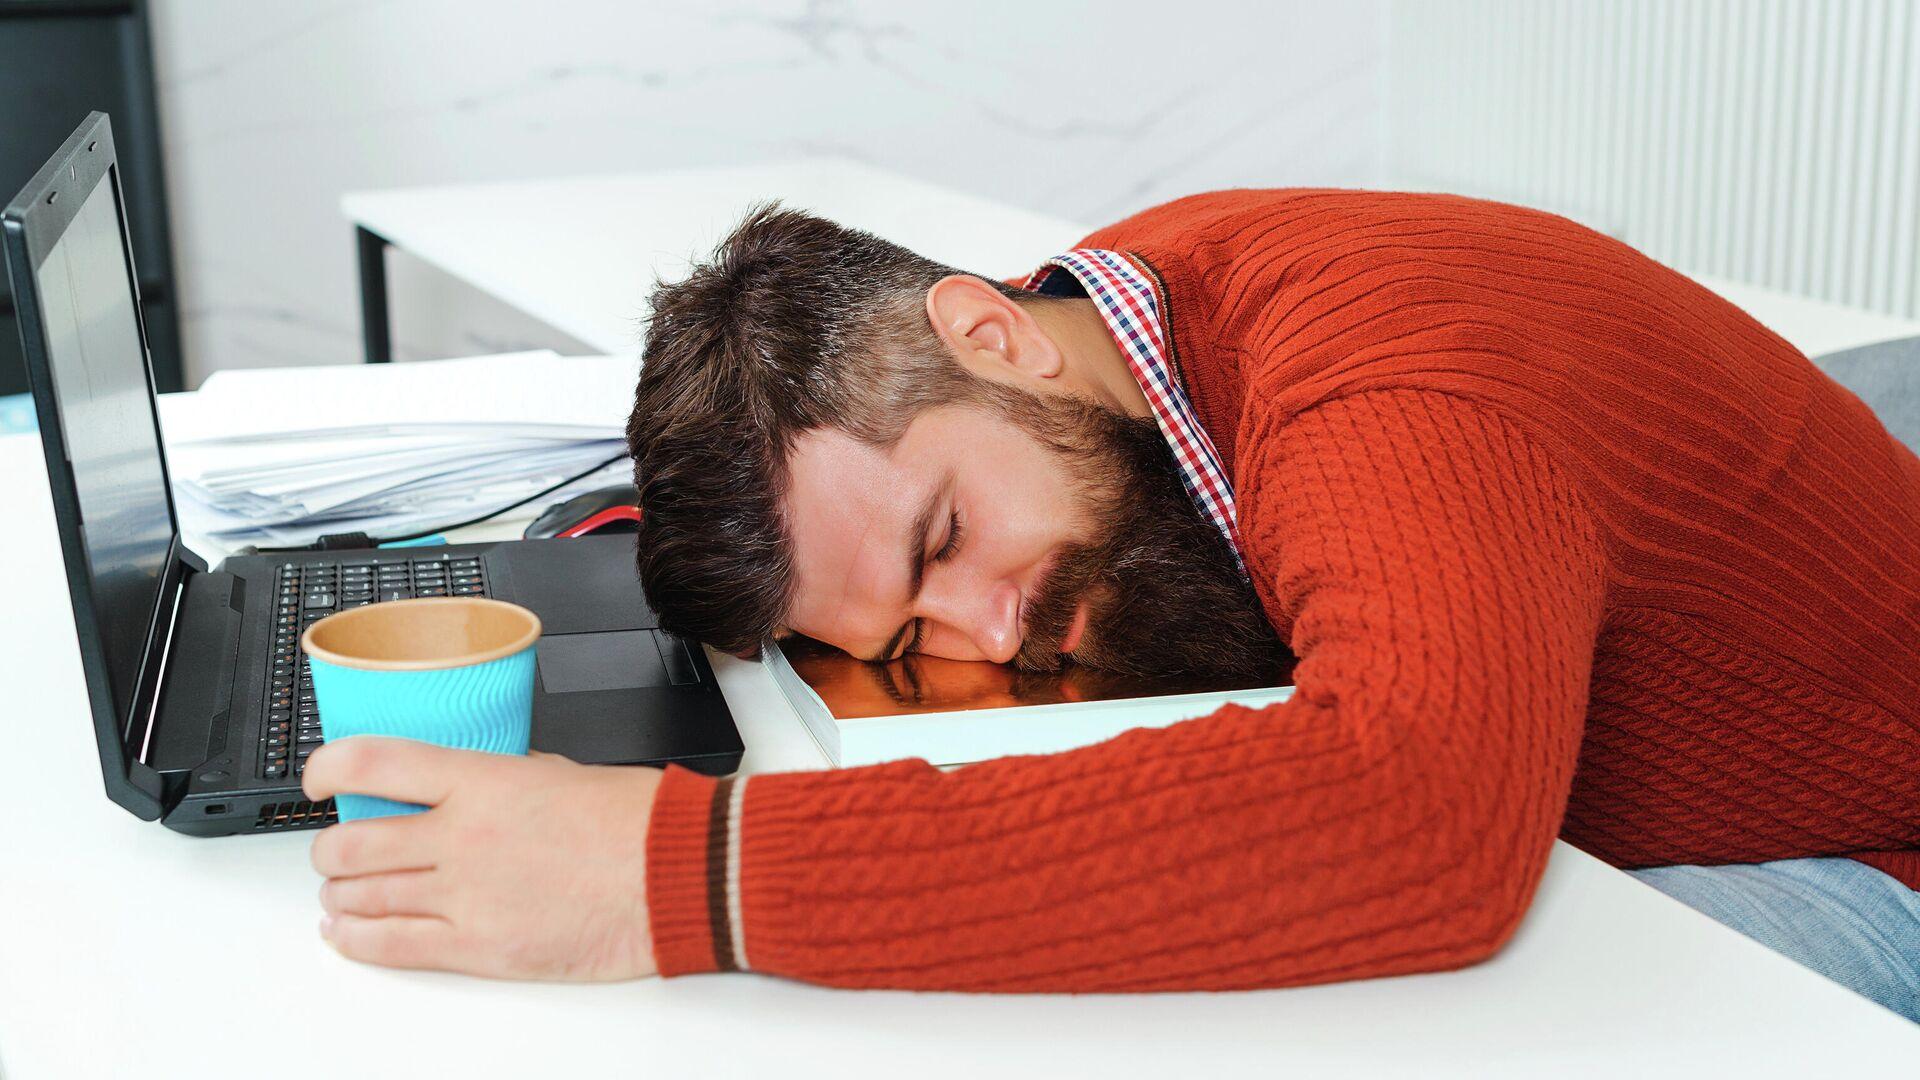 Уставший бизнесмен спит в офисе - РИА Новости, 1920, 22.10.2020